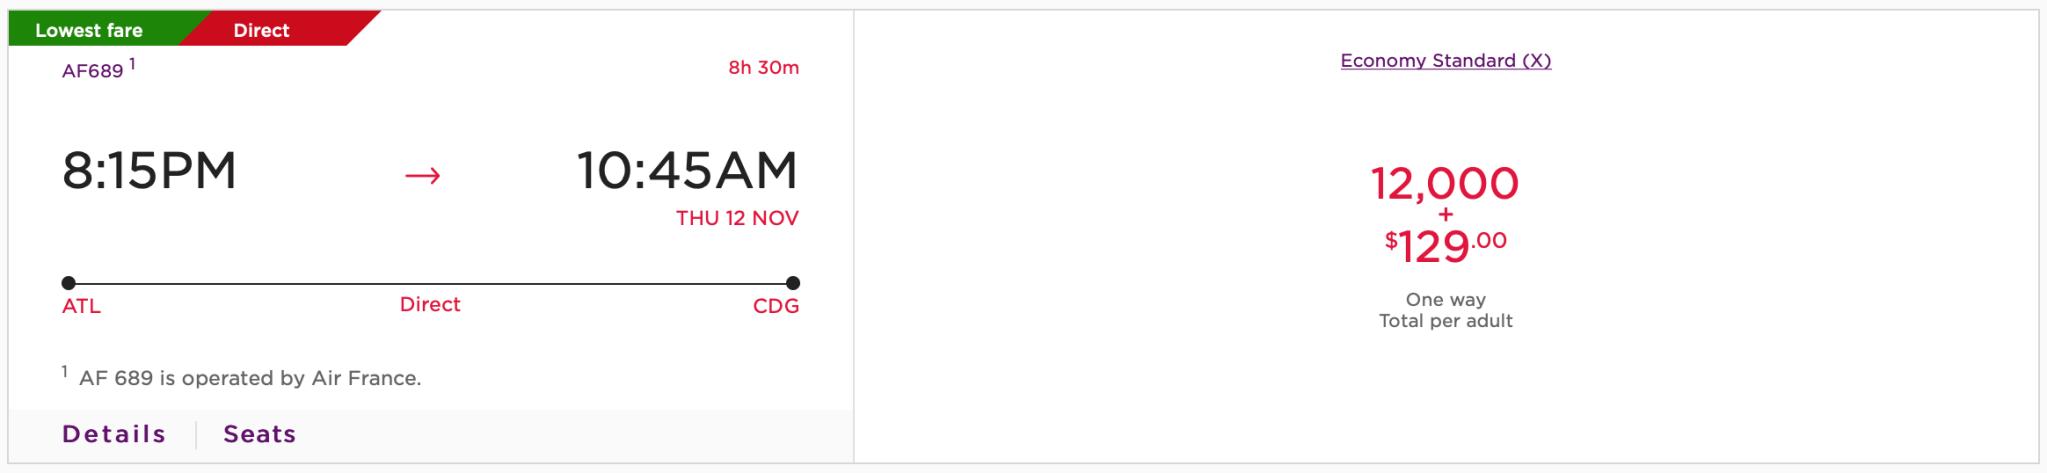 ATL CDG Virgin Atlantic Pricing for Air France Flight Screen Shot